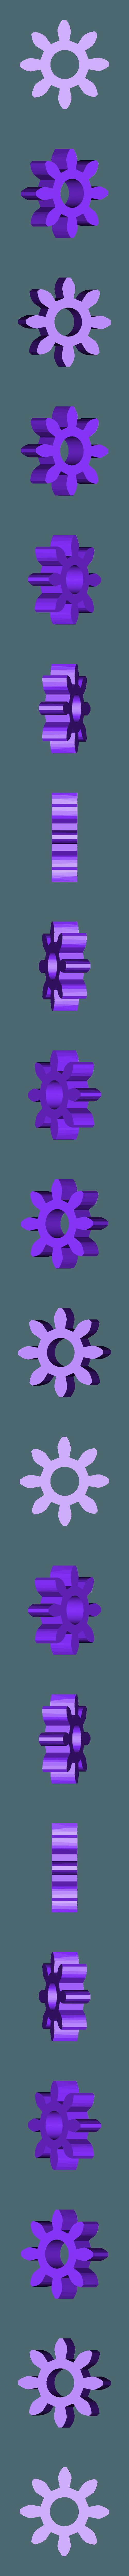 Simple_Gear.stl Download free STL file TOYOTA GEAR KEY CHAIN • 3D printer template, GREGCAR_3DPrinting